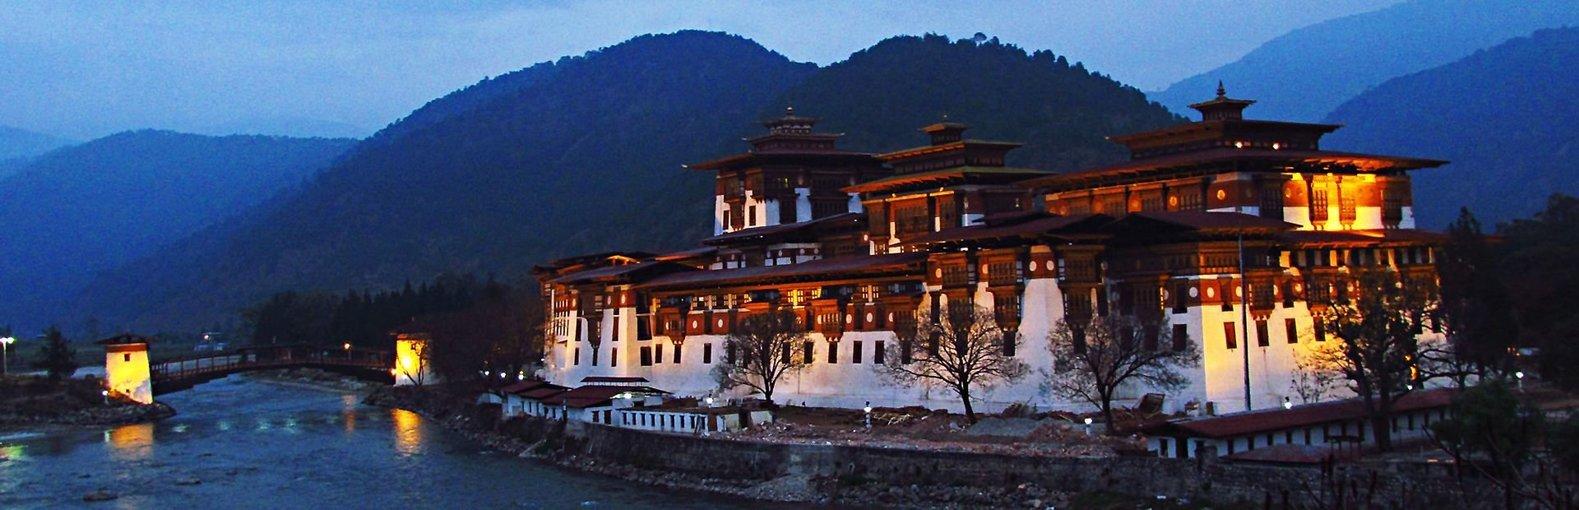 Bhutan - Land of the Thunder Dragon! - Tour